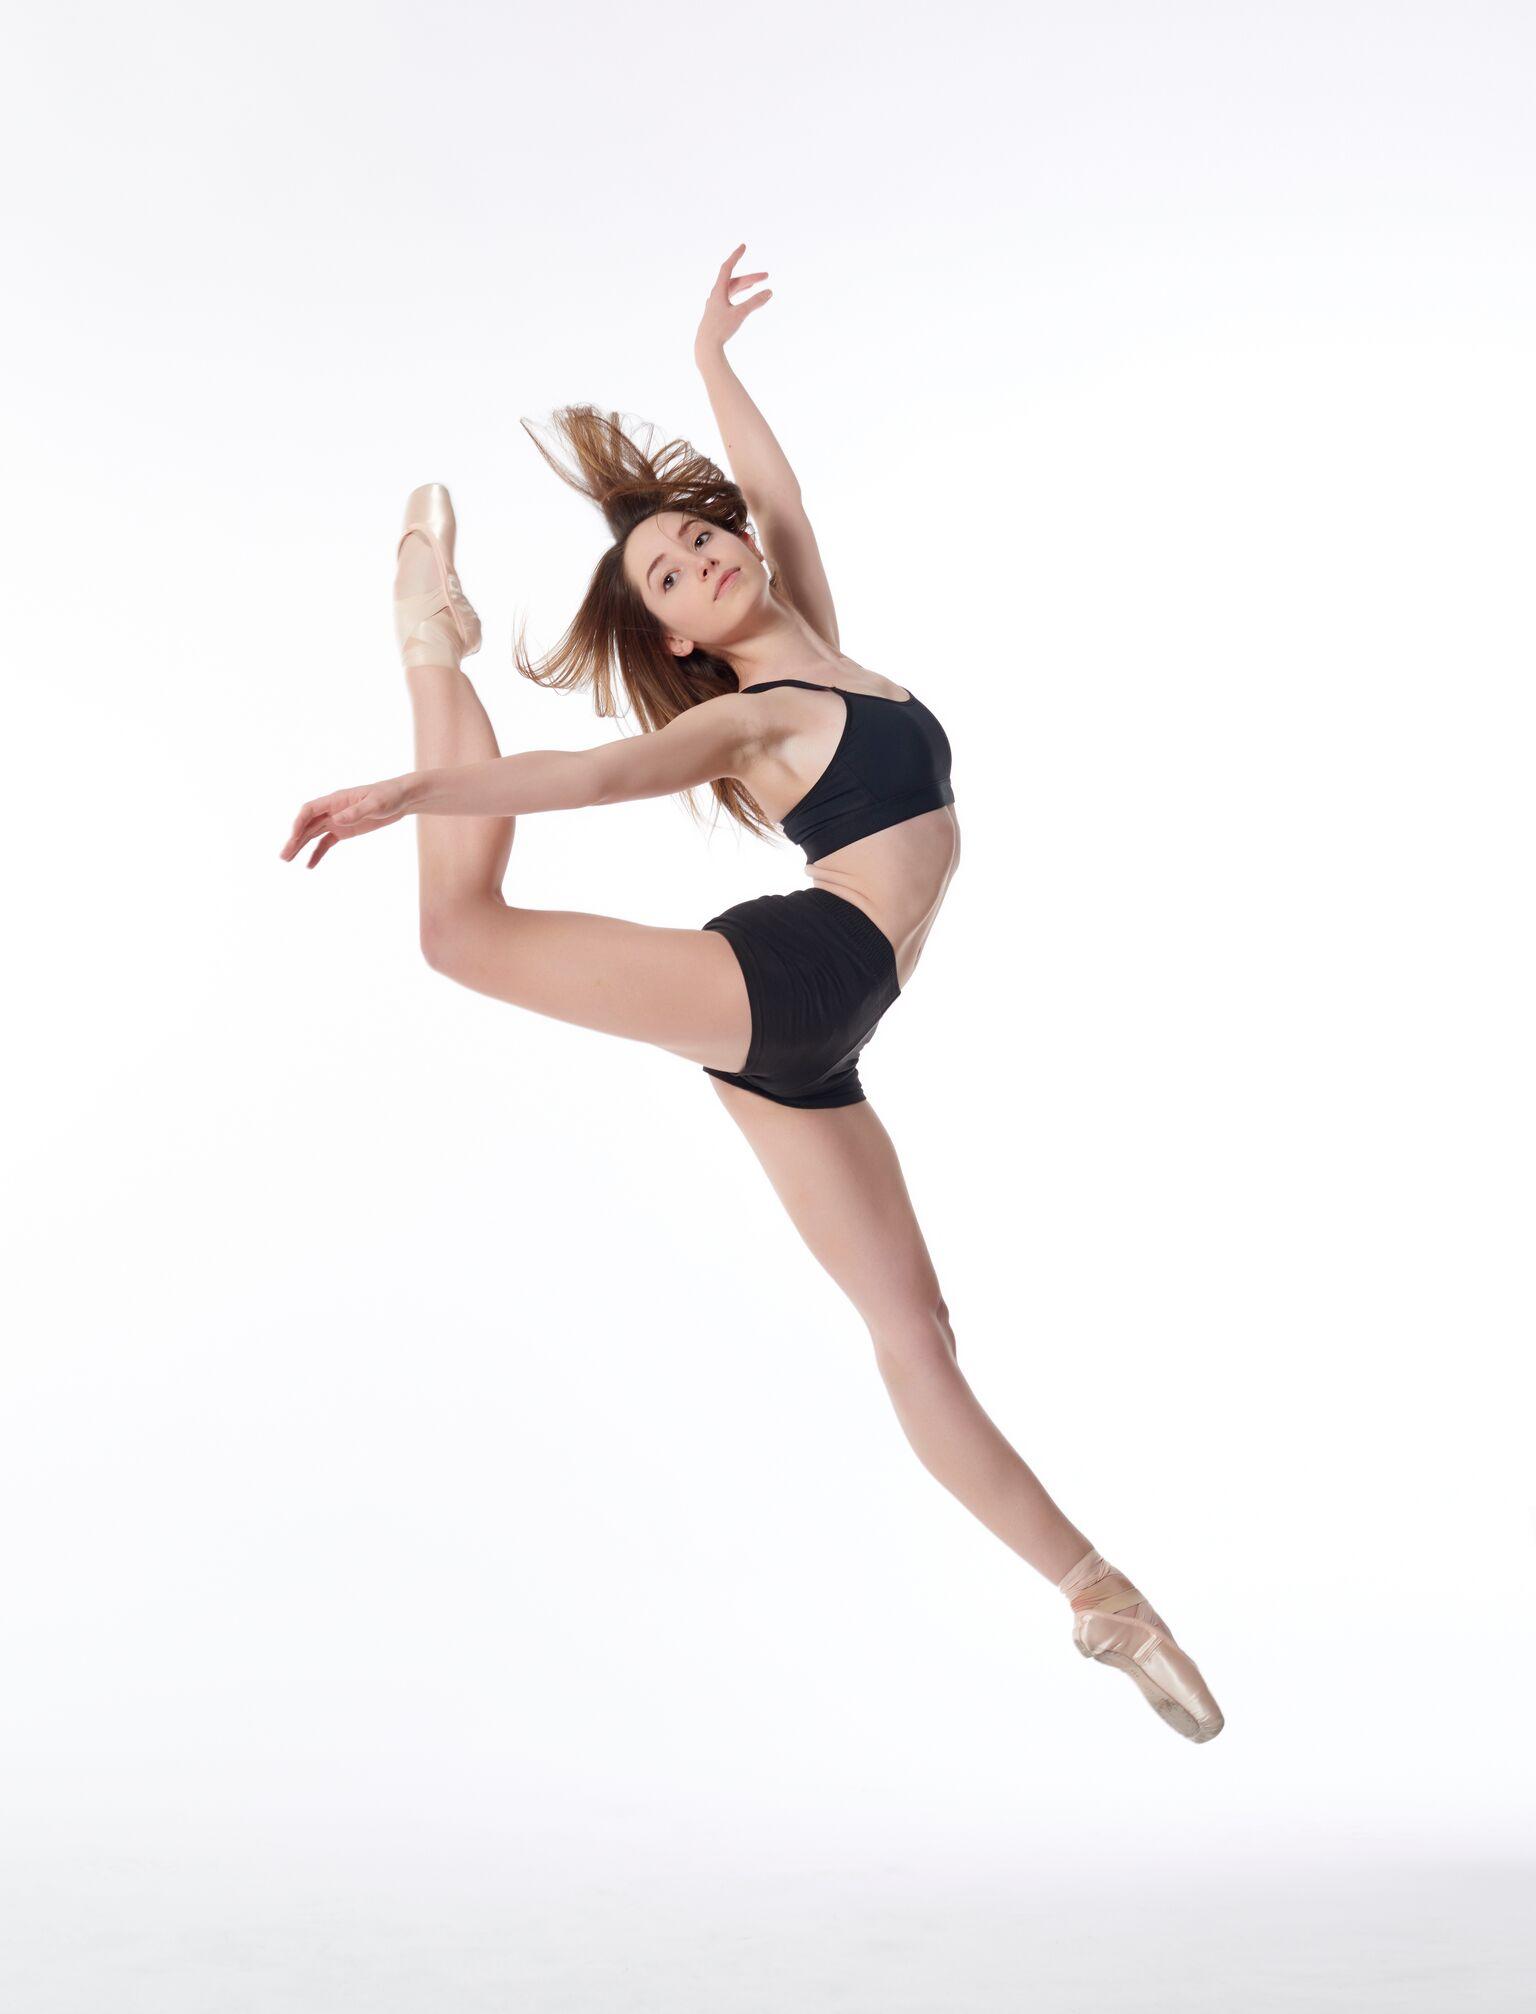 Leah Hiller